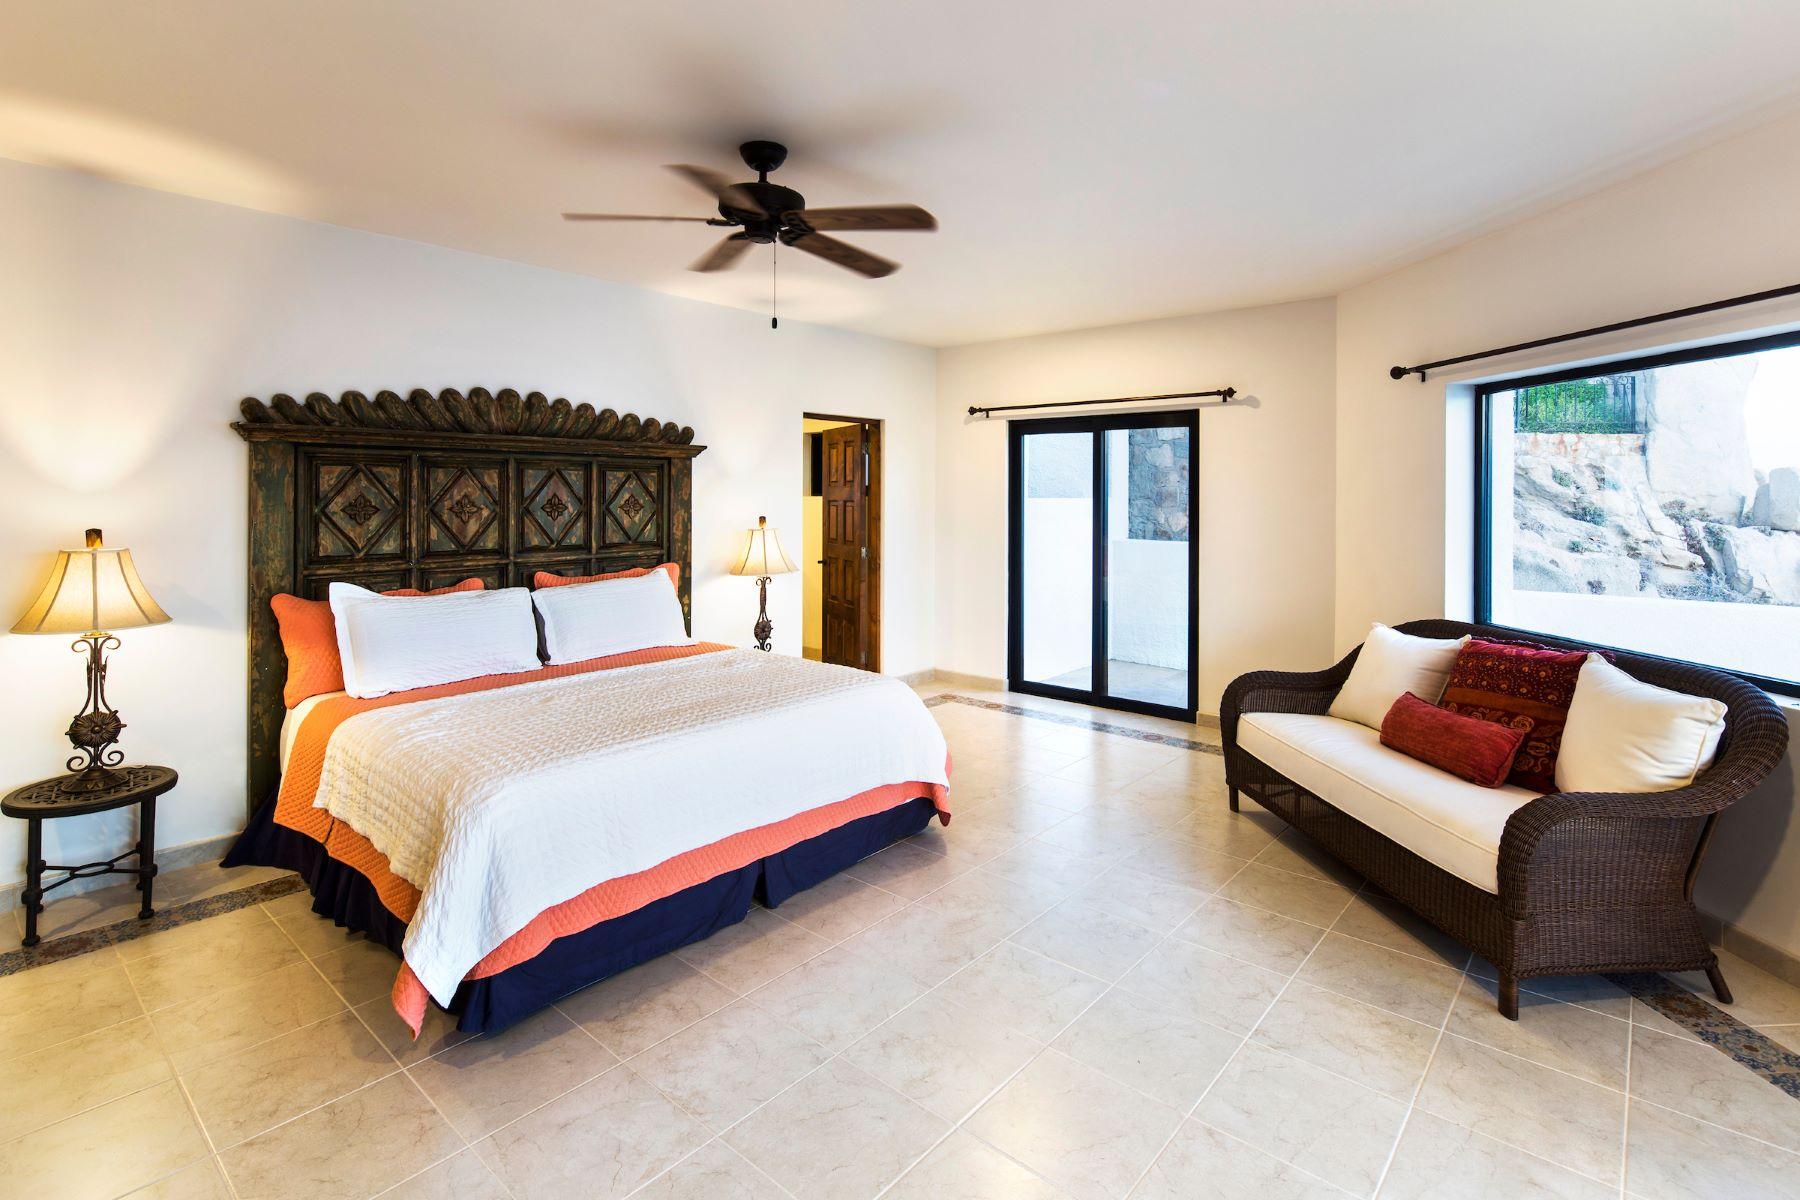 Additional photo for property listing at Casa La Favorita Other Baja California Sur, Baja California Sur Mexico